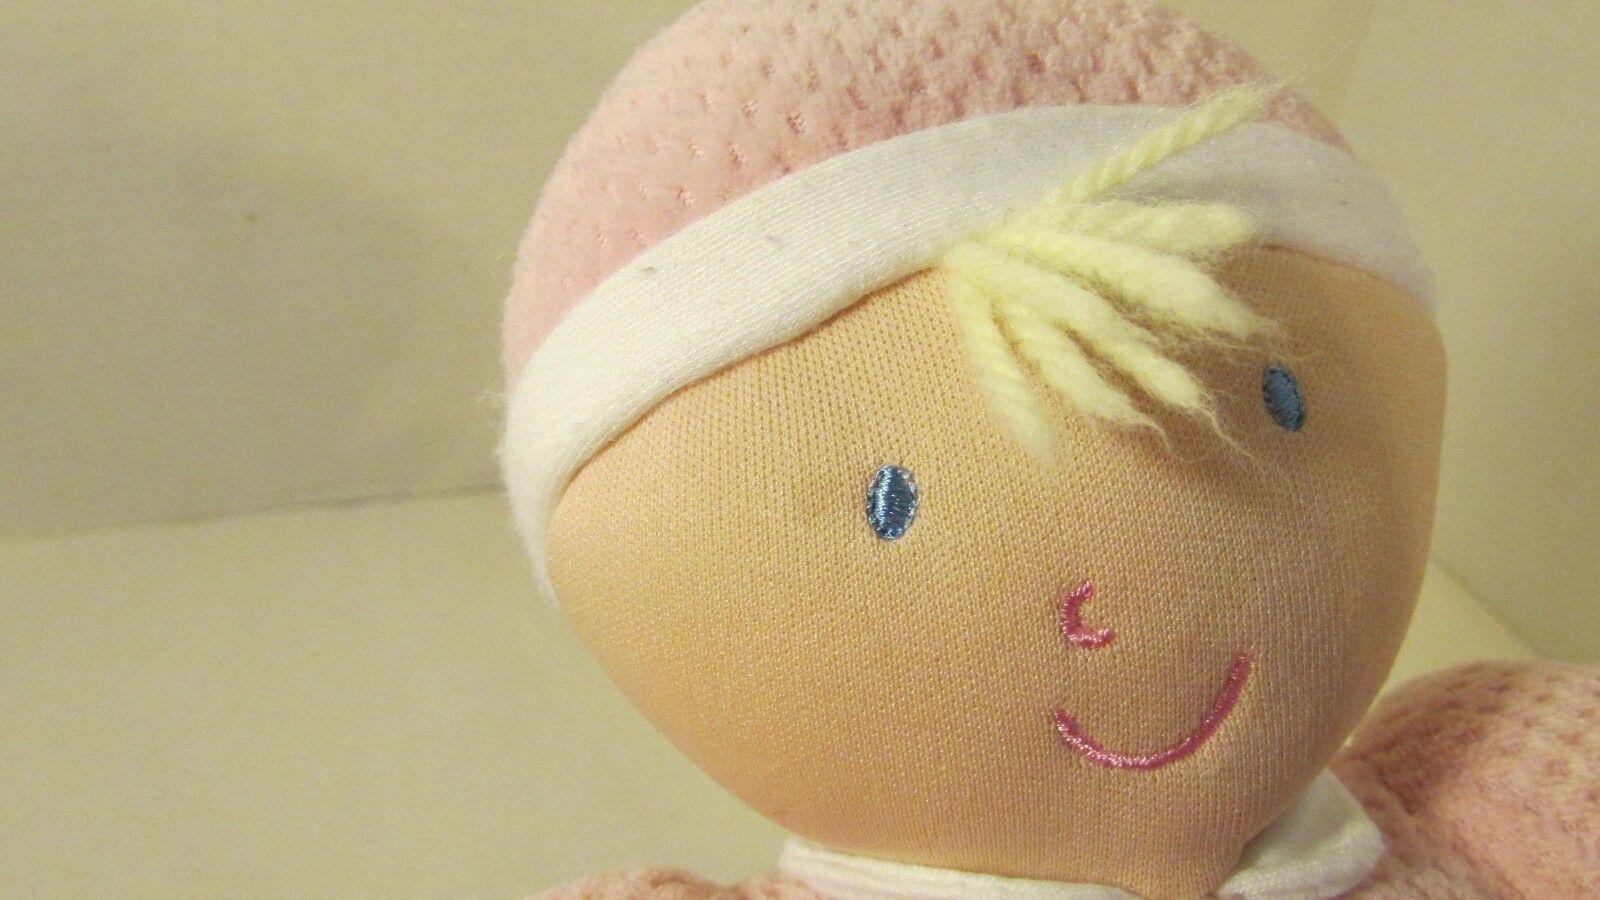 Kids Preferred doll baby soft plush pink thermal satin trim hat blonde hair image 3